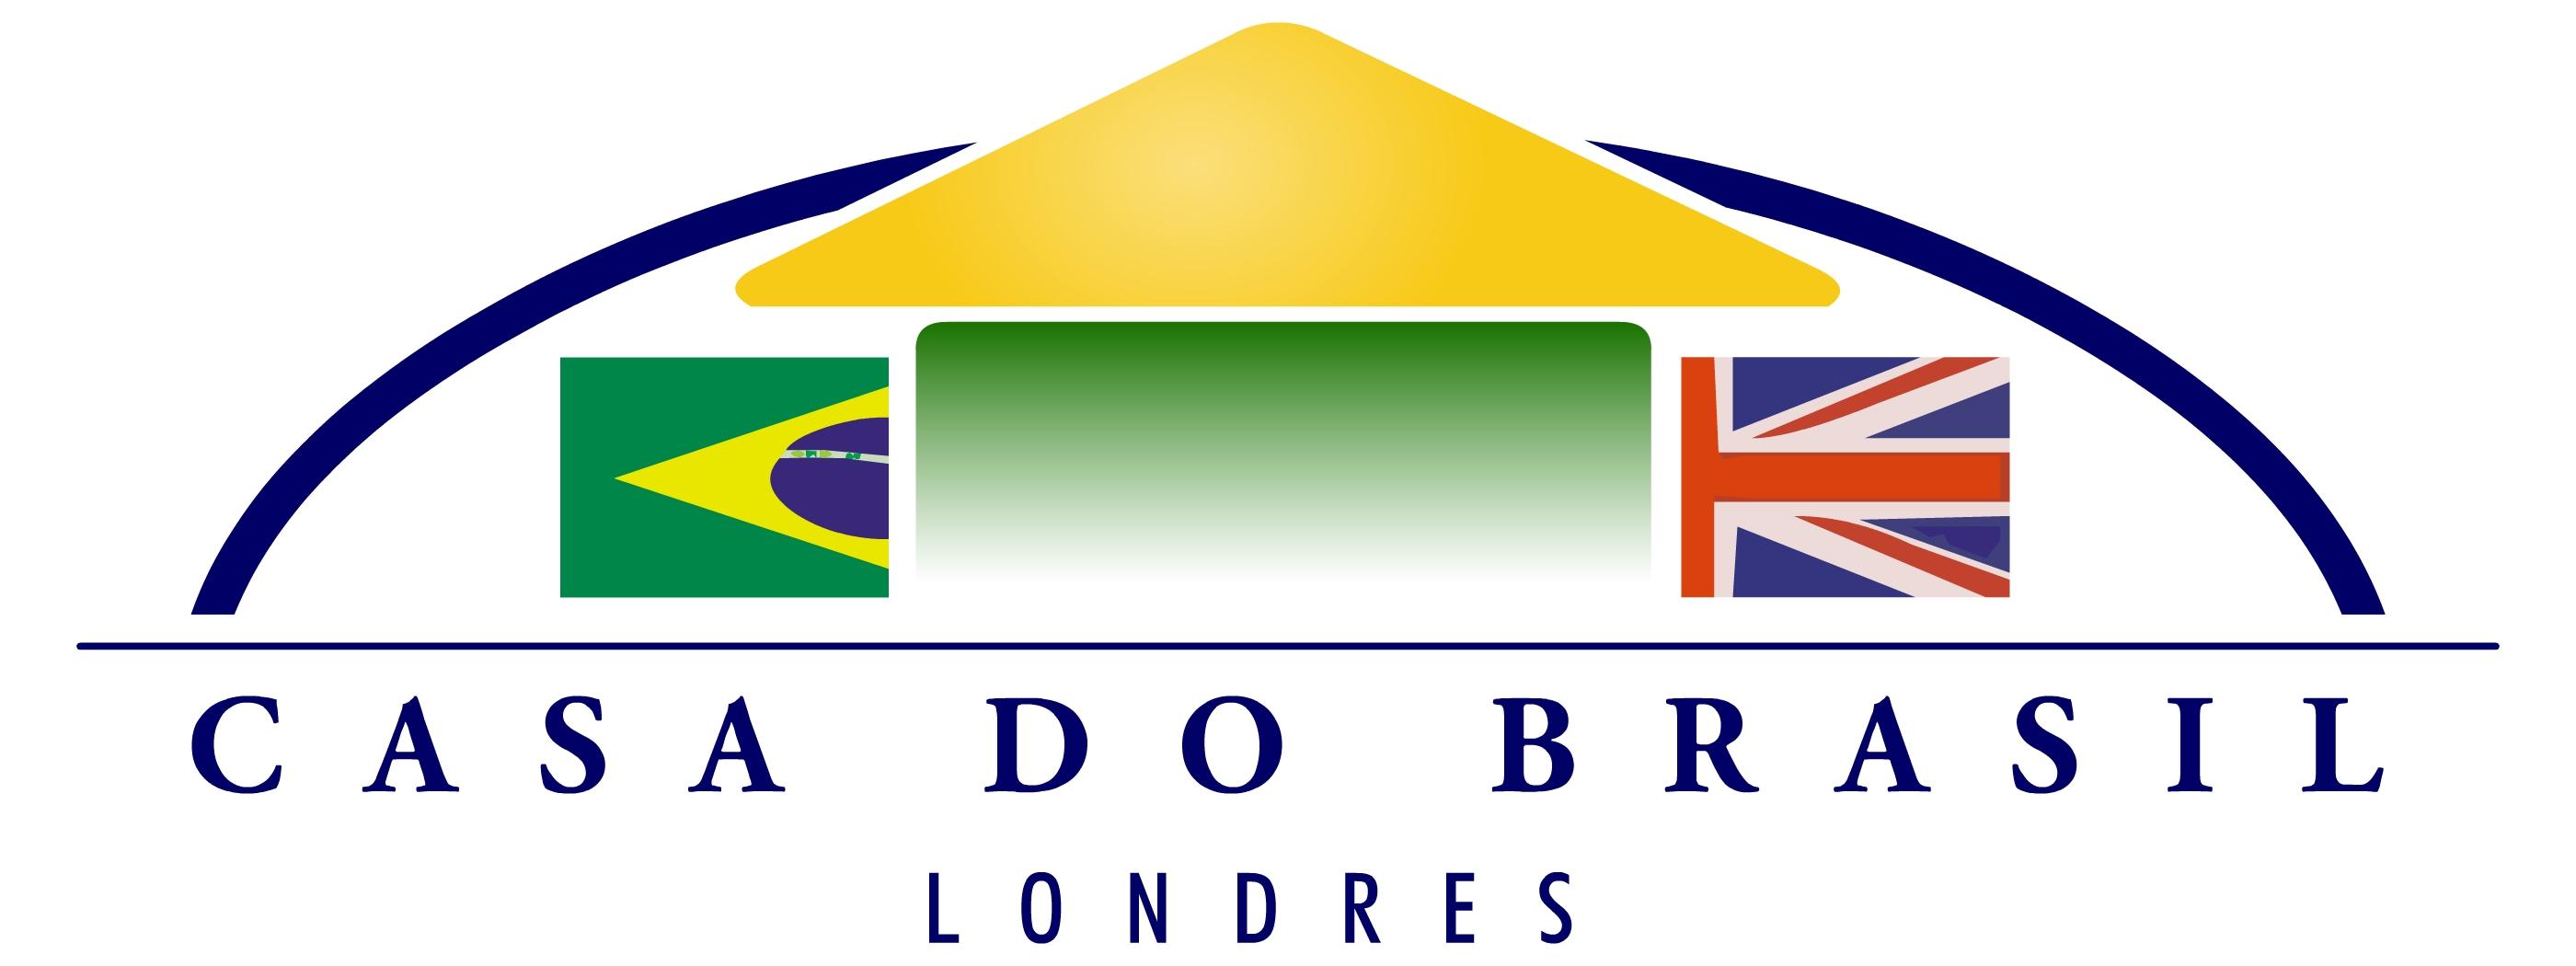 casa Brasil logo